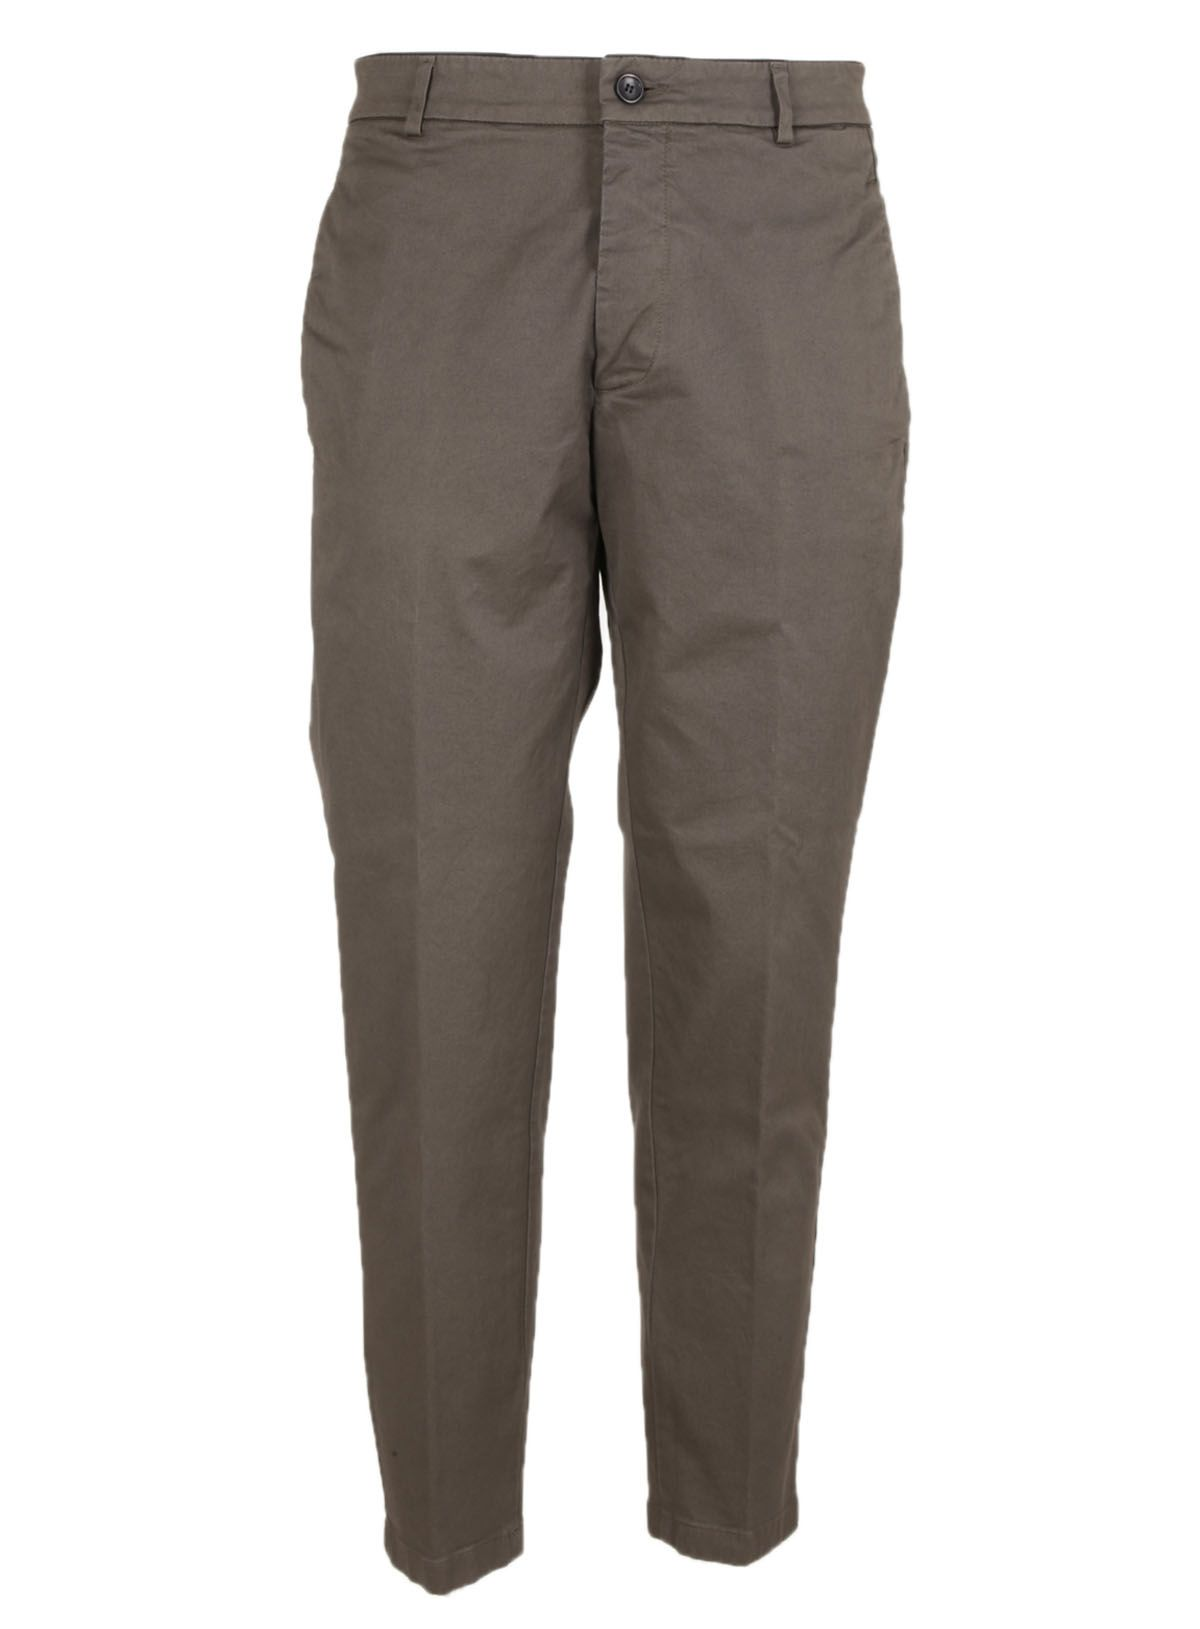 Department 5 Straight Leg Trousers